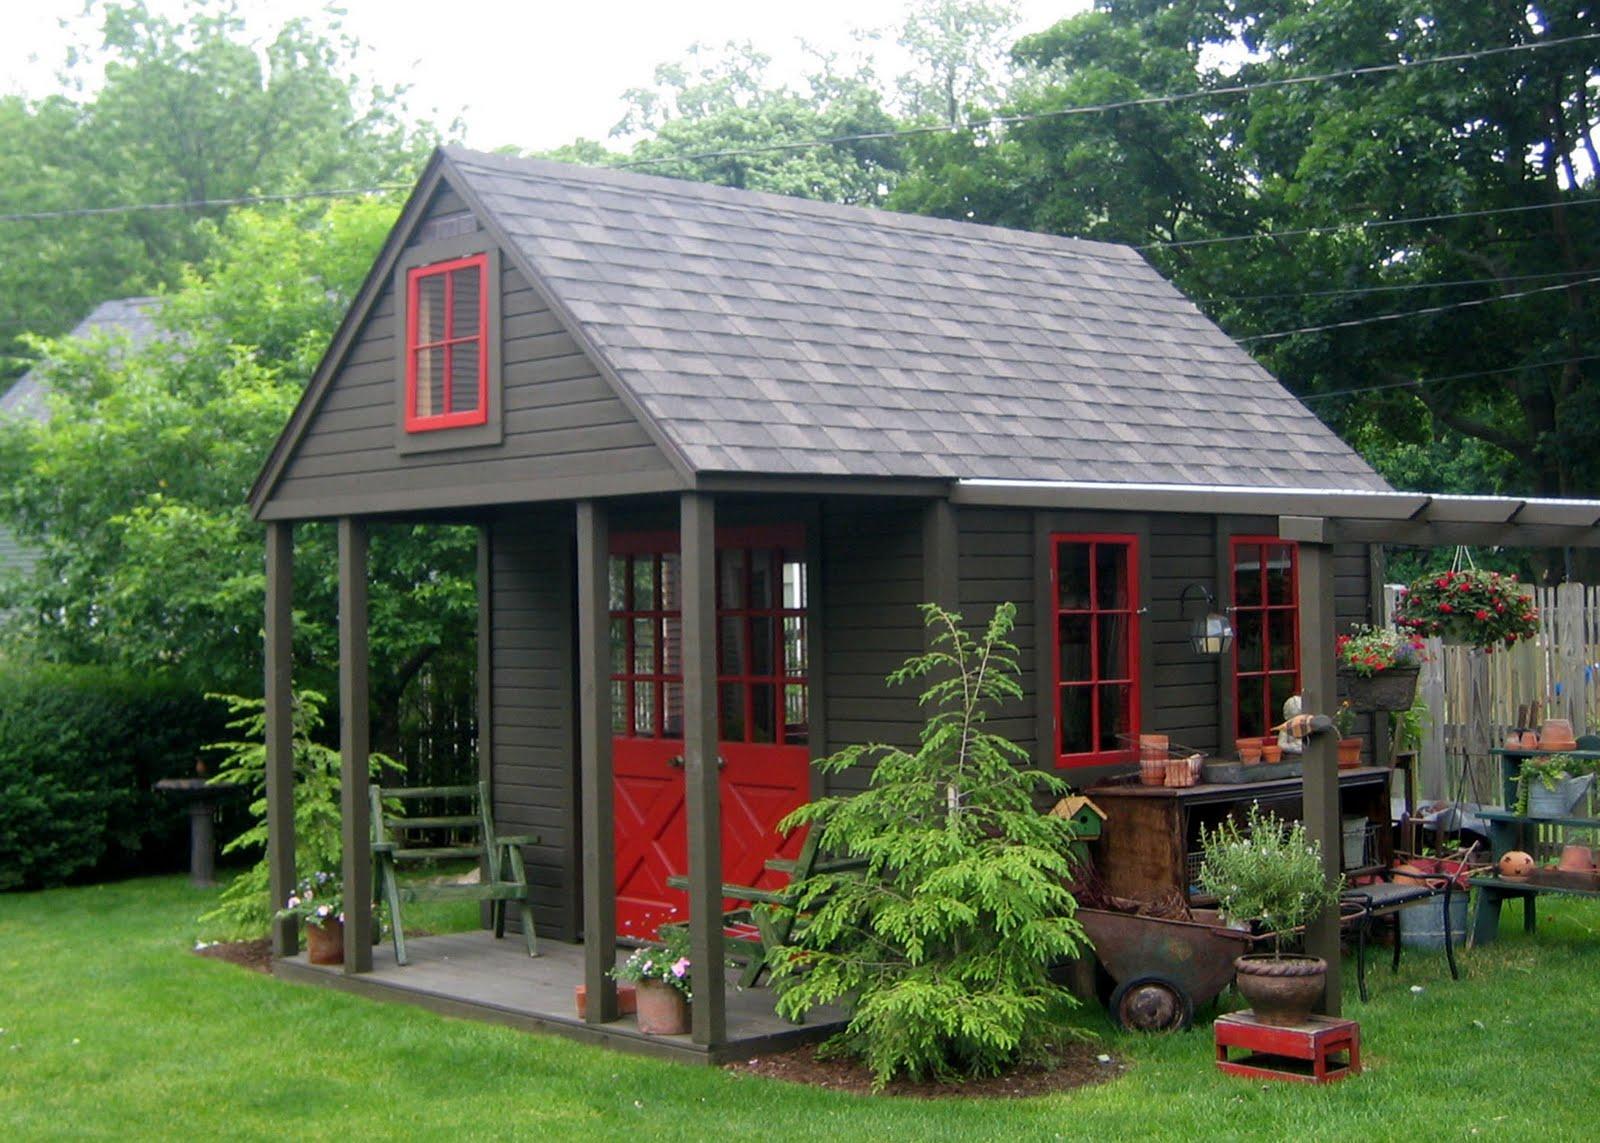 Nappanee Home and Garden Club: GARDEN SHEDS, PORCHES ... on Backyard Retreat Ideas id=96092